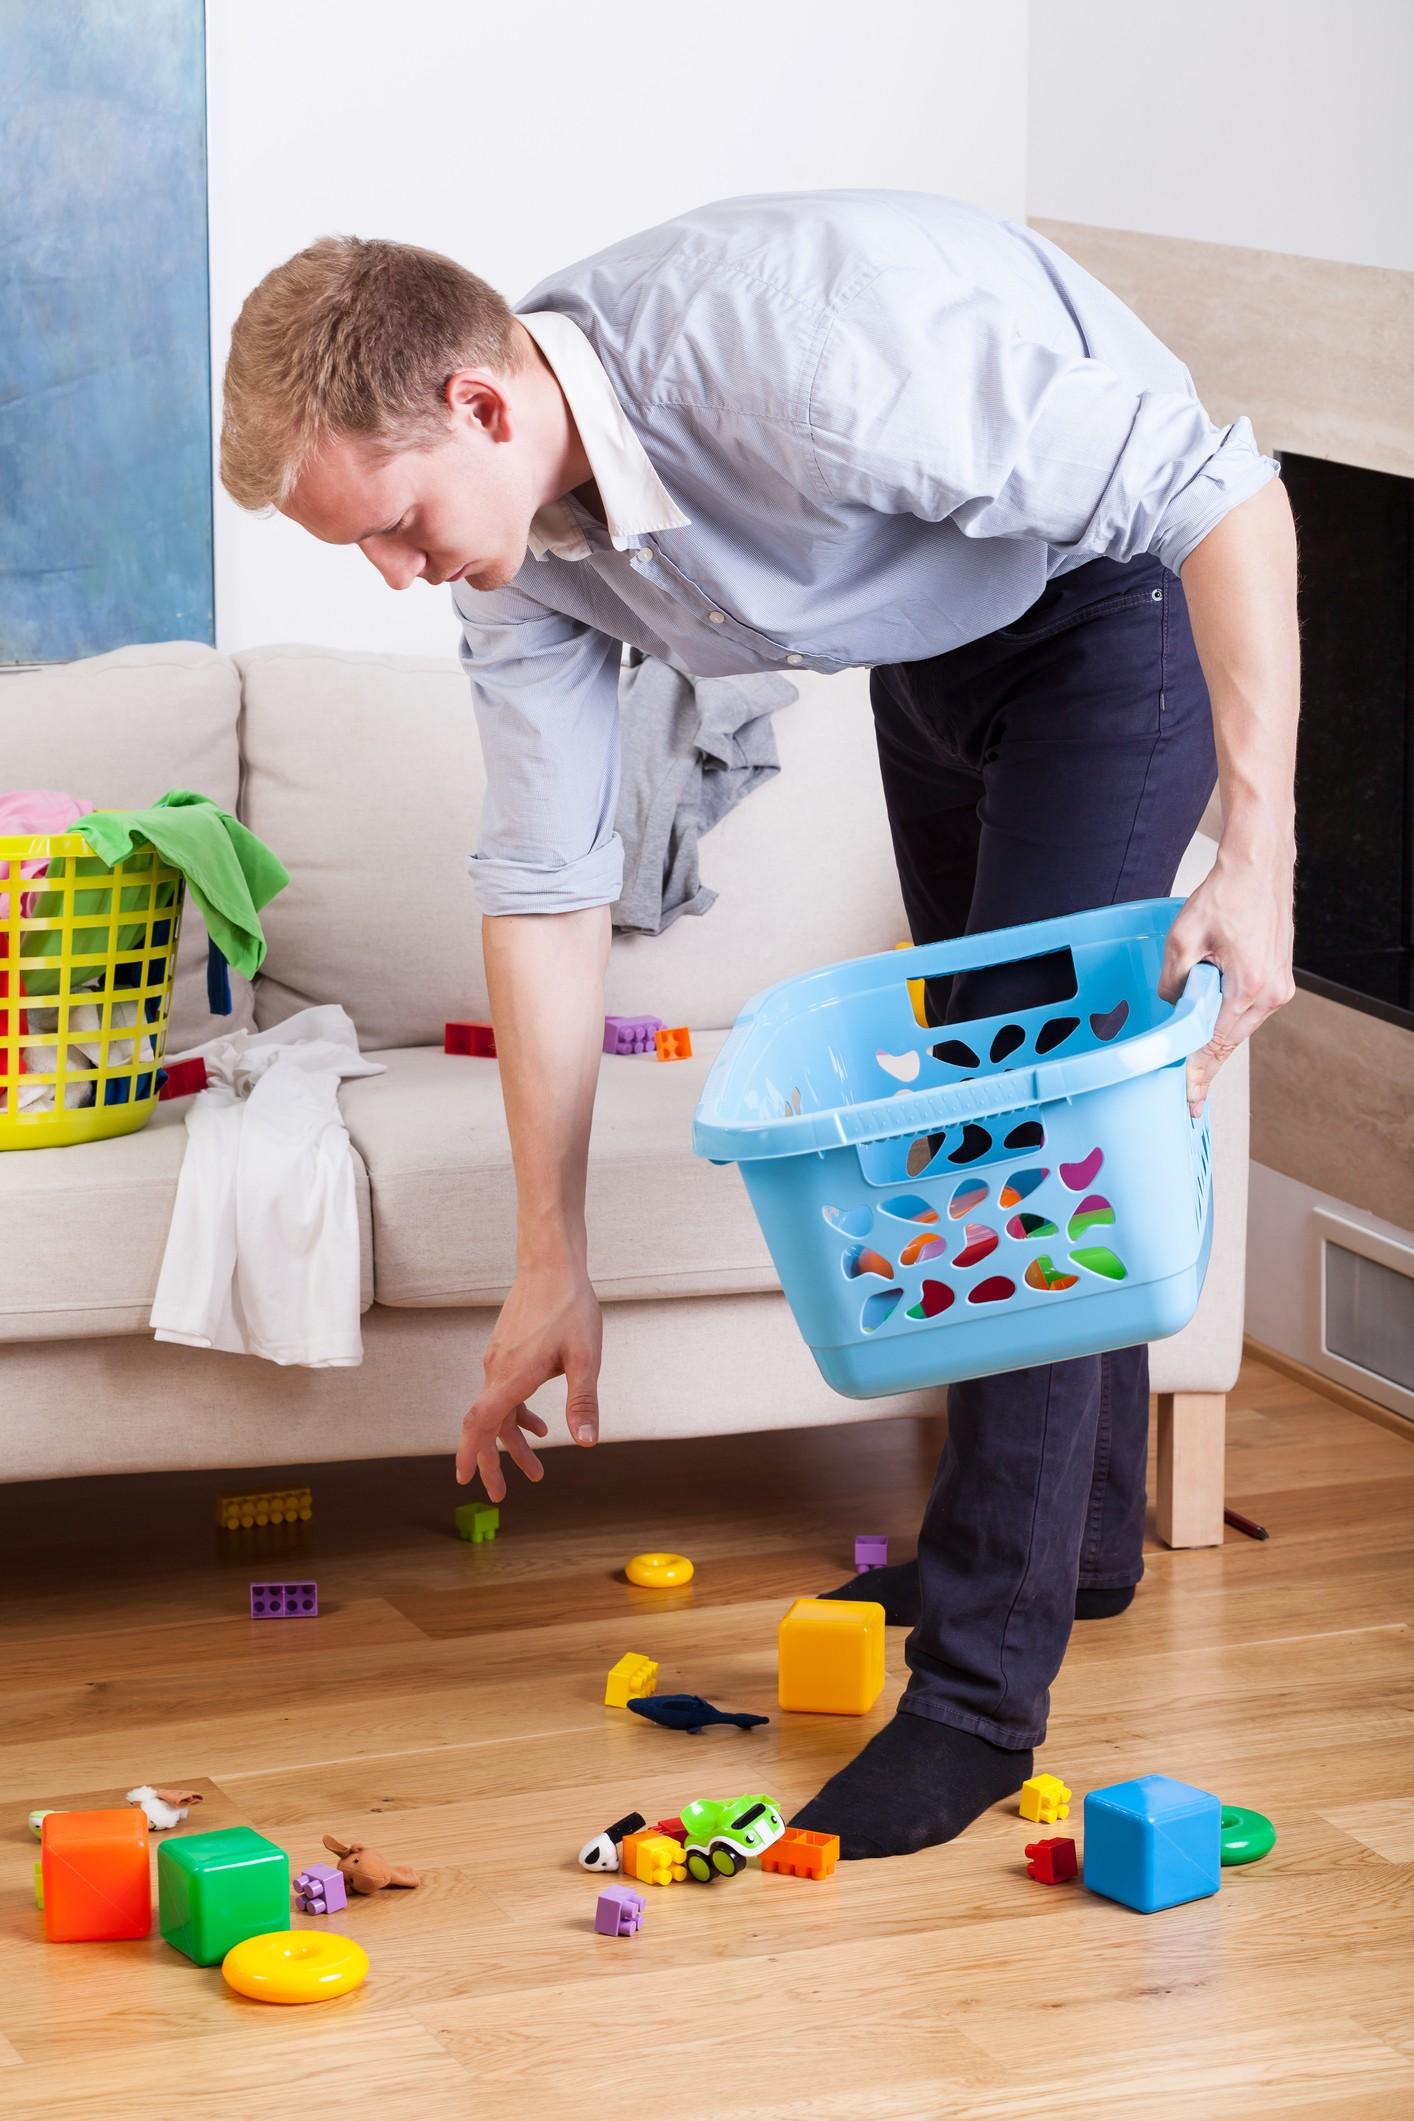 Man organizing toys